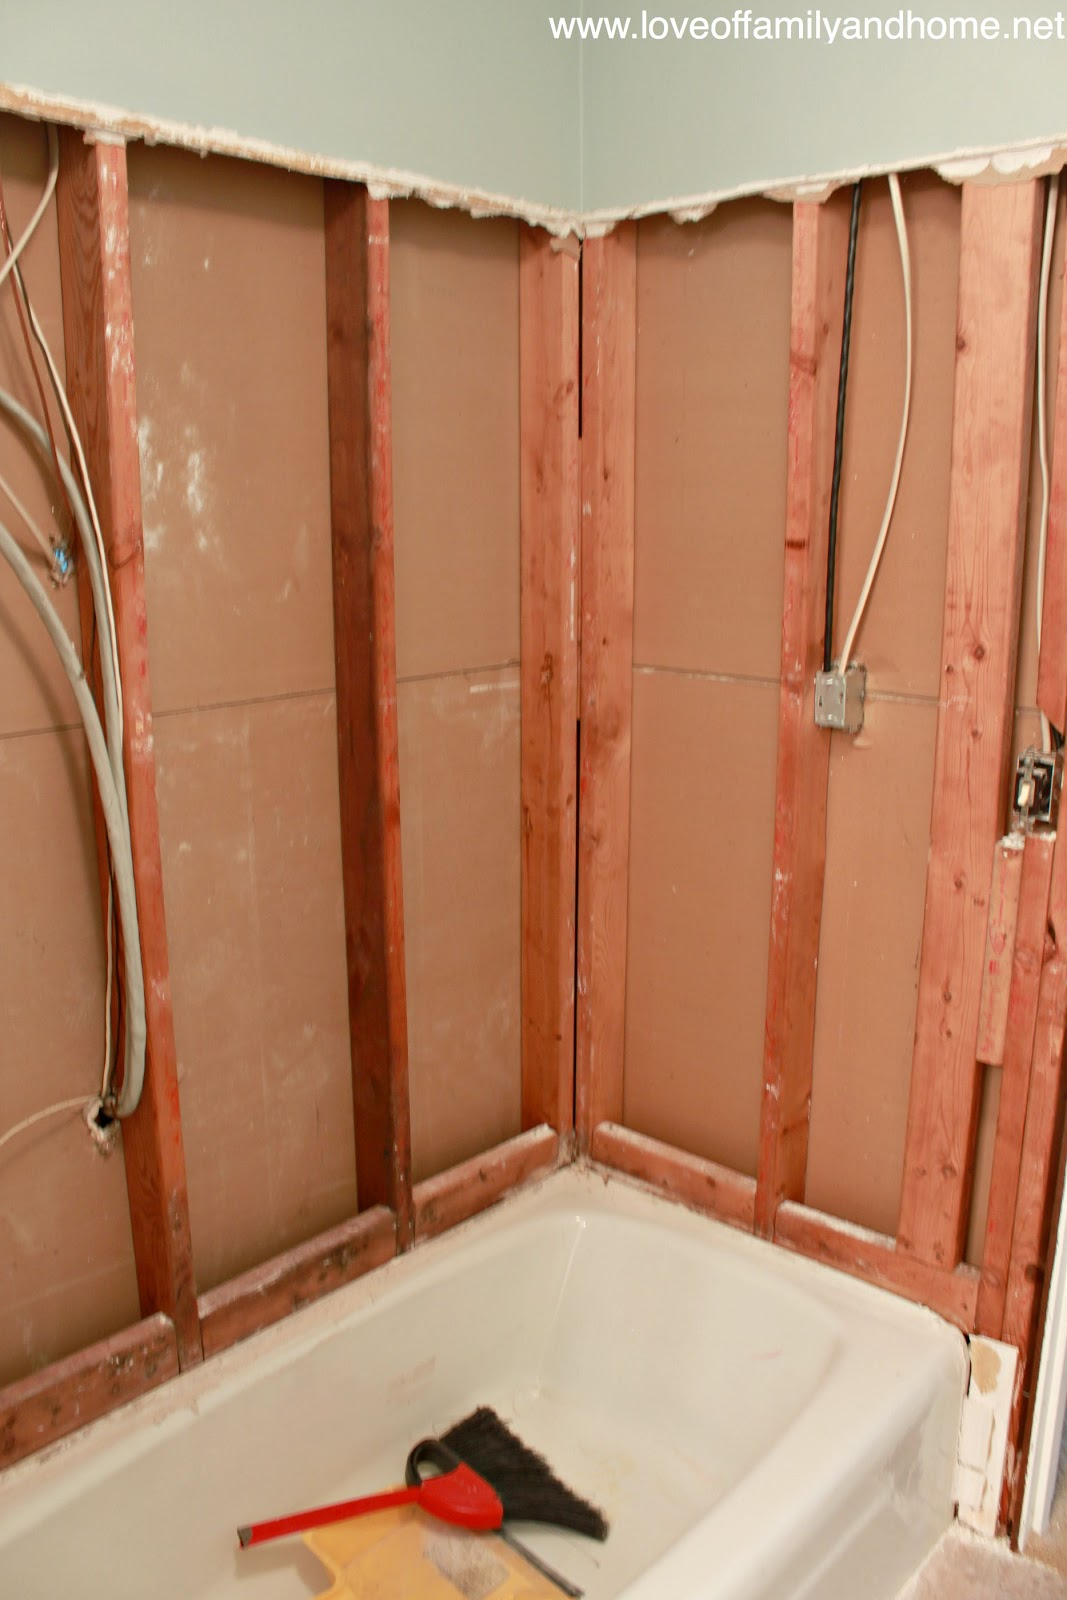 The Hallway Bathroom Flooring Amp A Shower Demolition